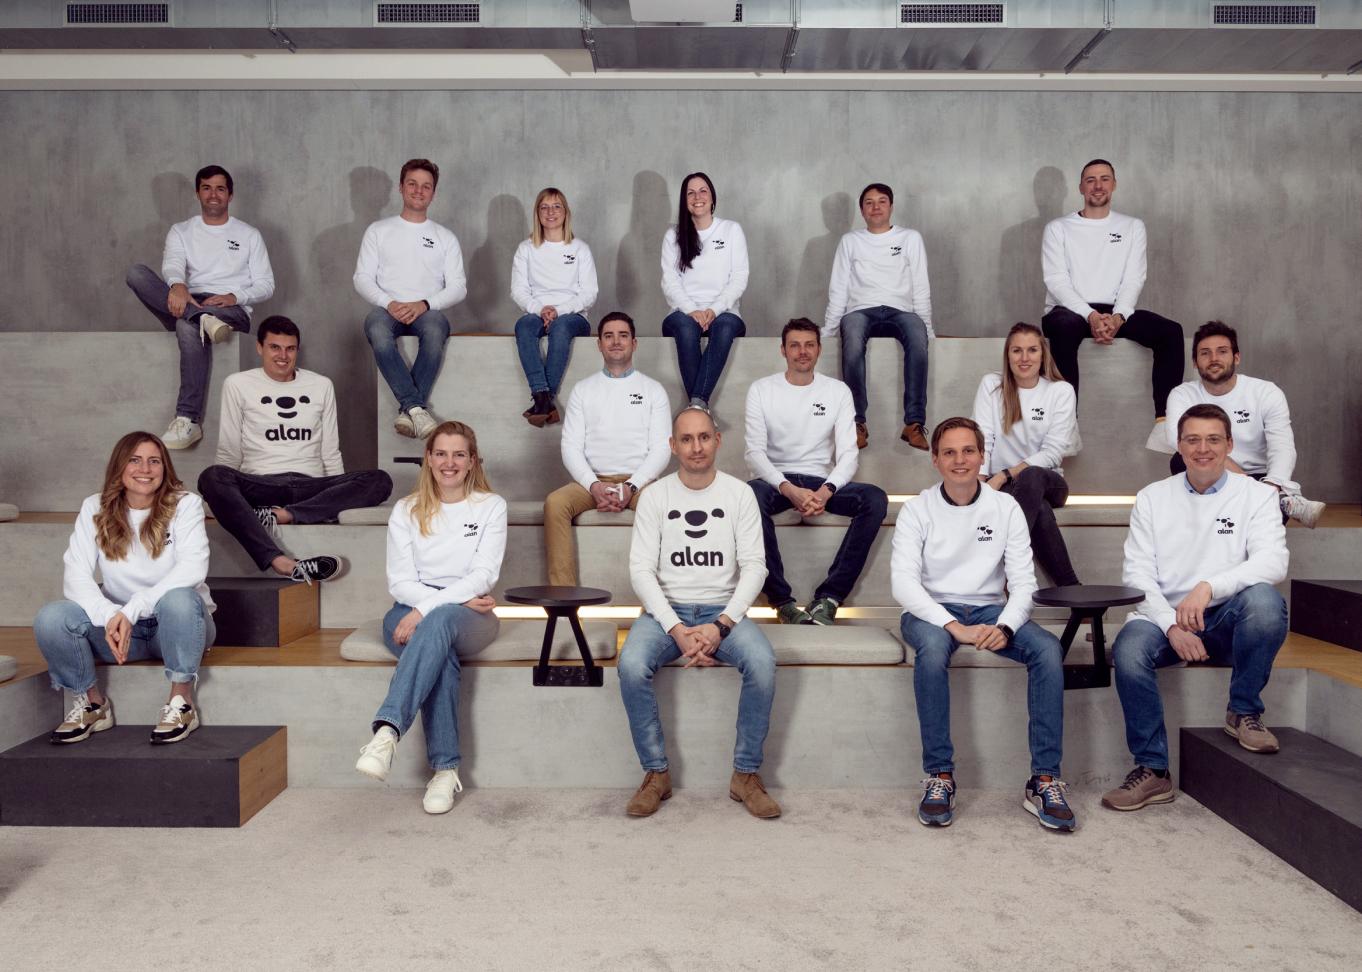 Photo of the Alan belgium team